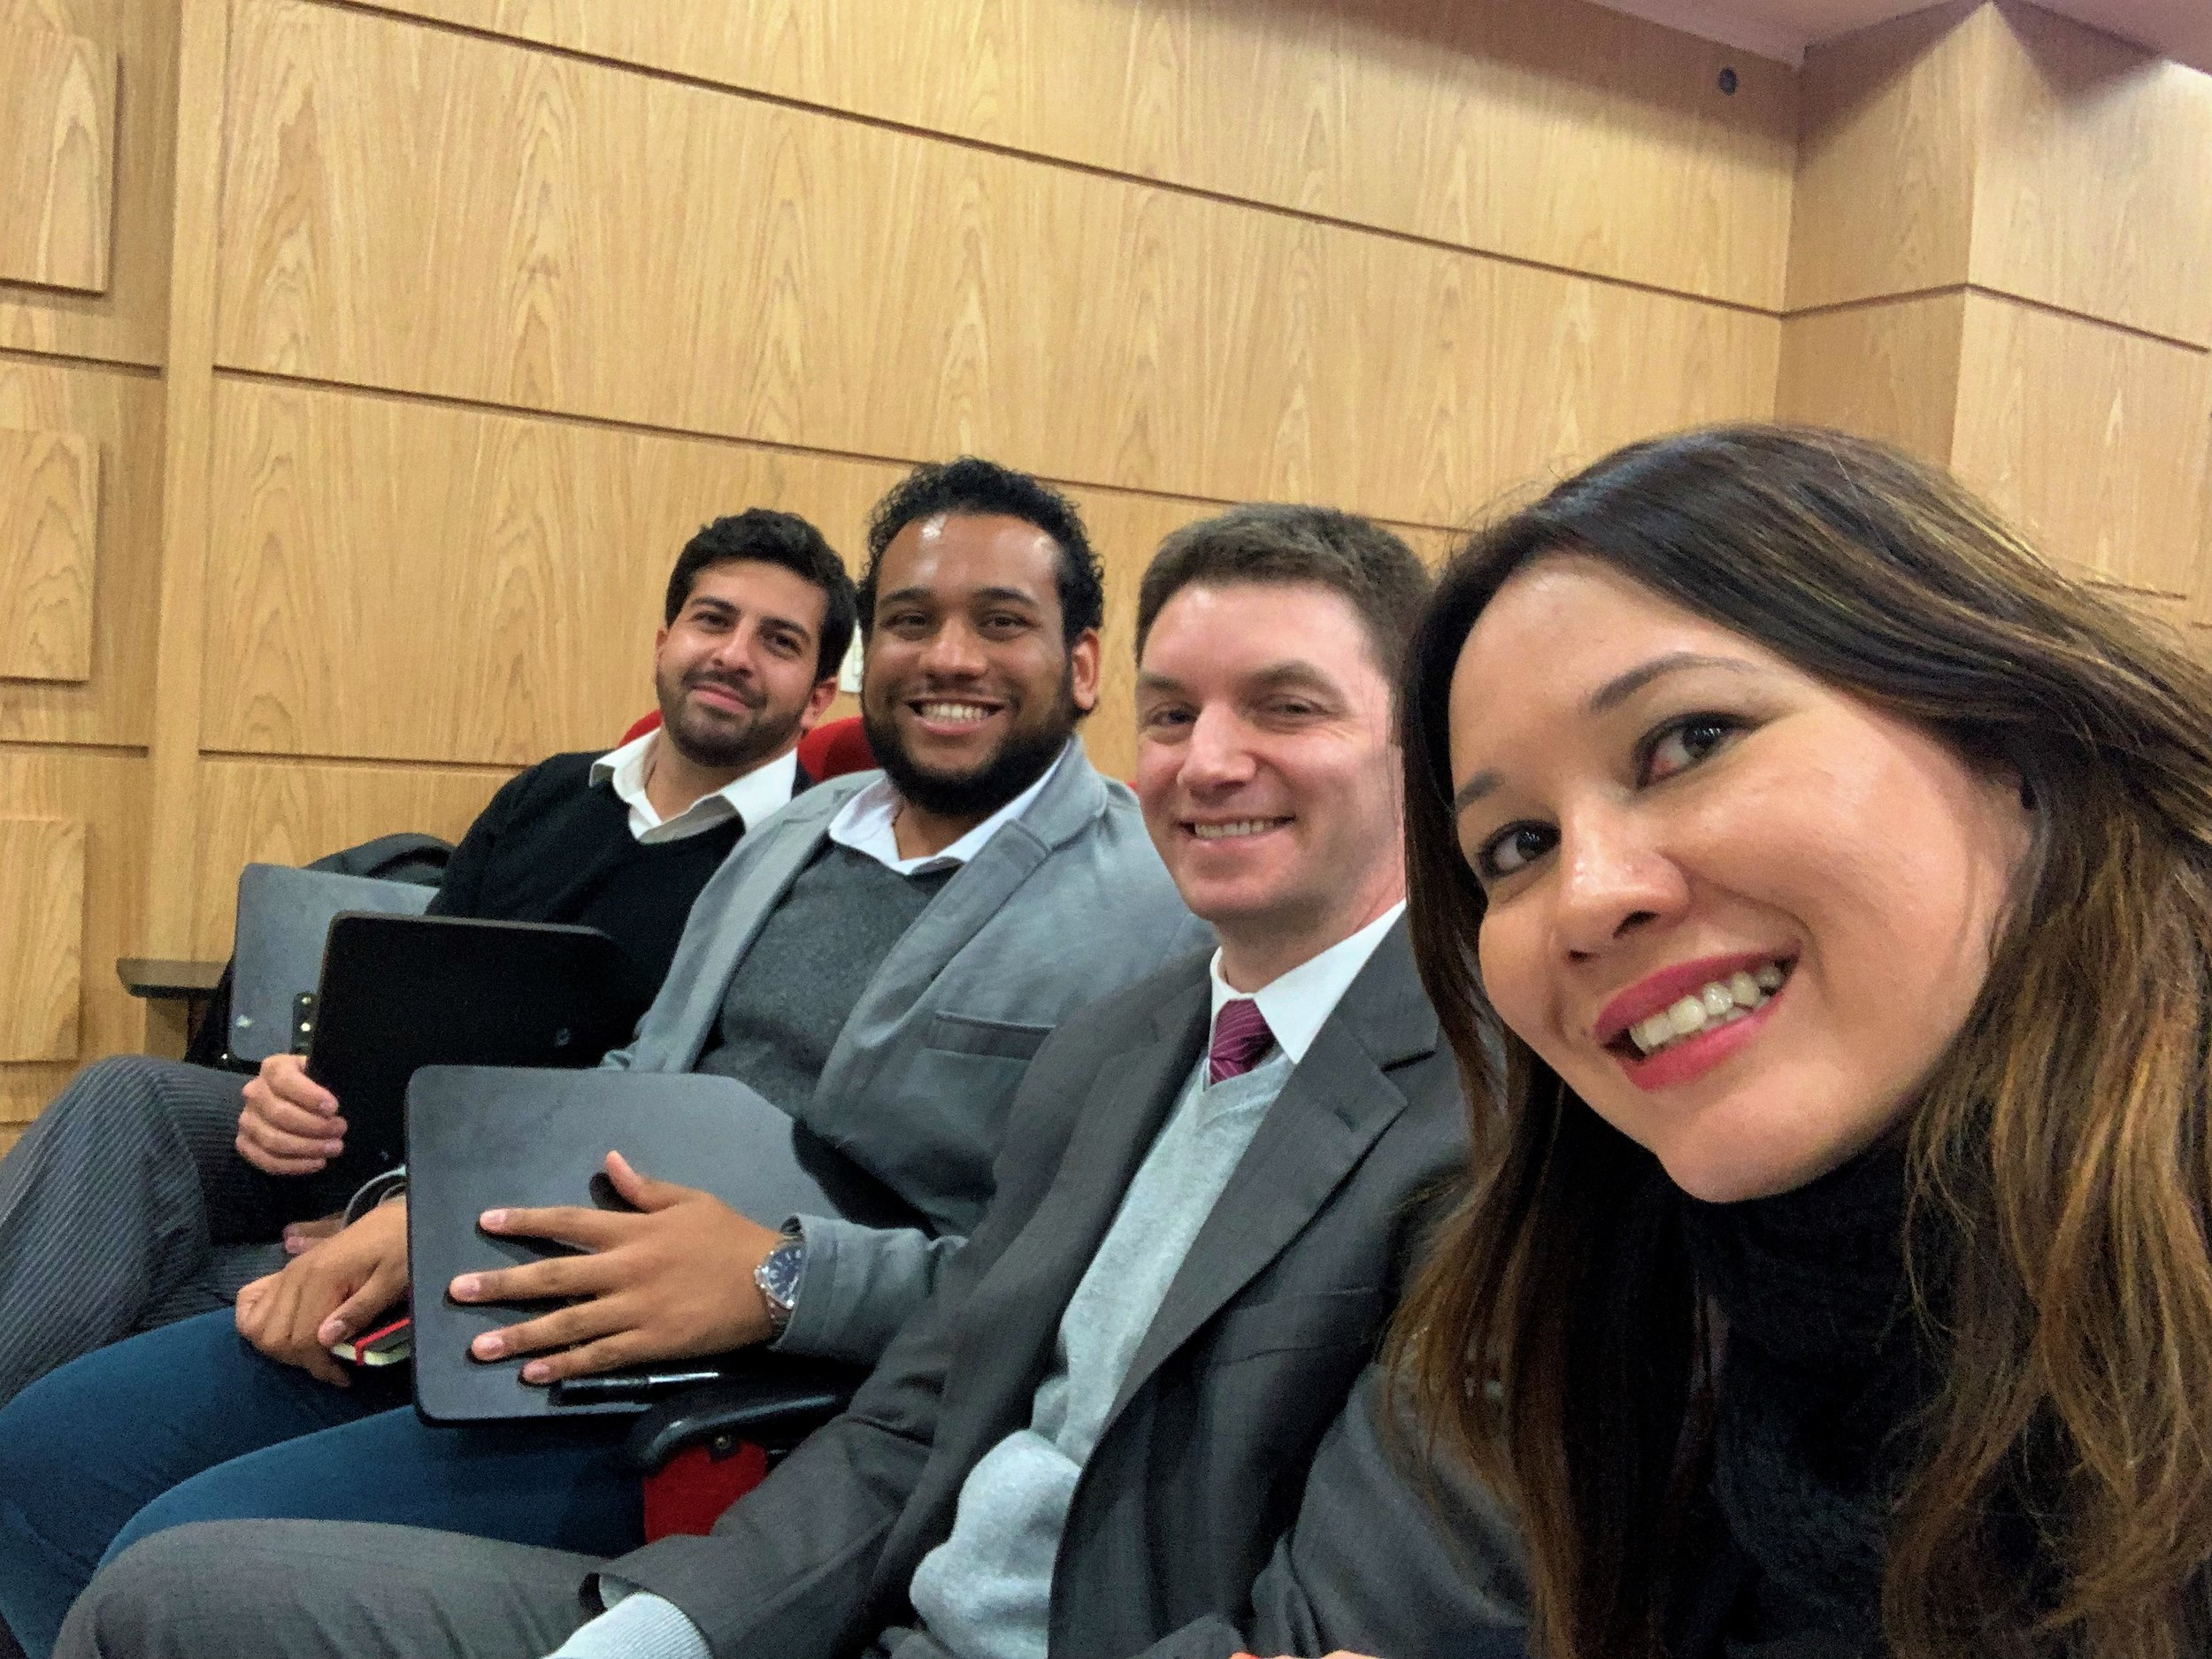 Professores Fernando Magri, Nikolay Bispo, Rafael Marcondes e Gabriela Araujo, na plateia, prestigiando o evento.